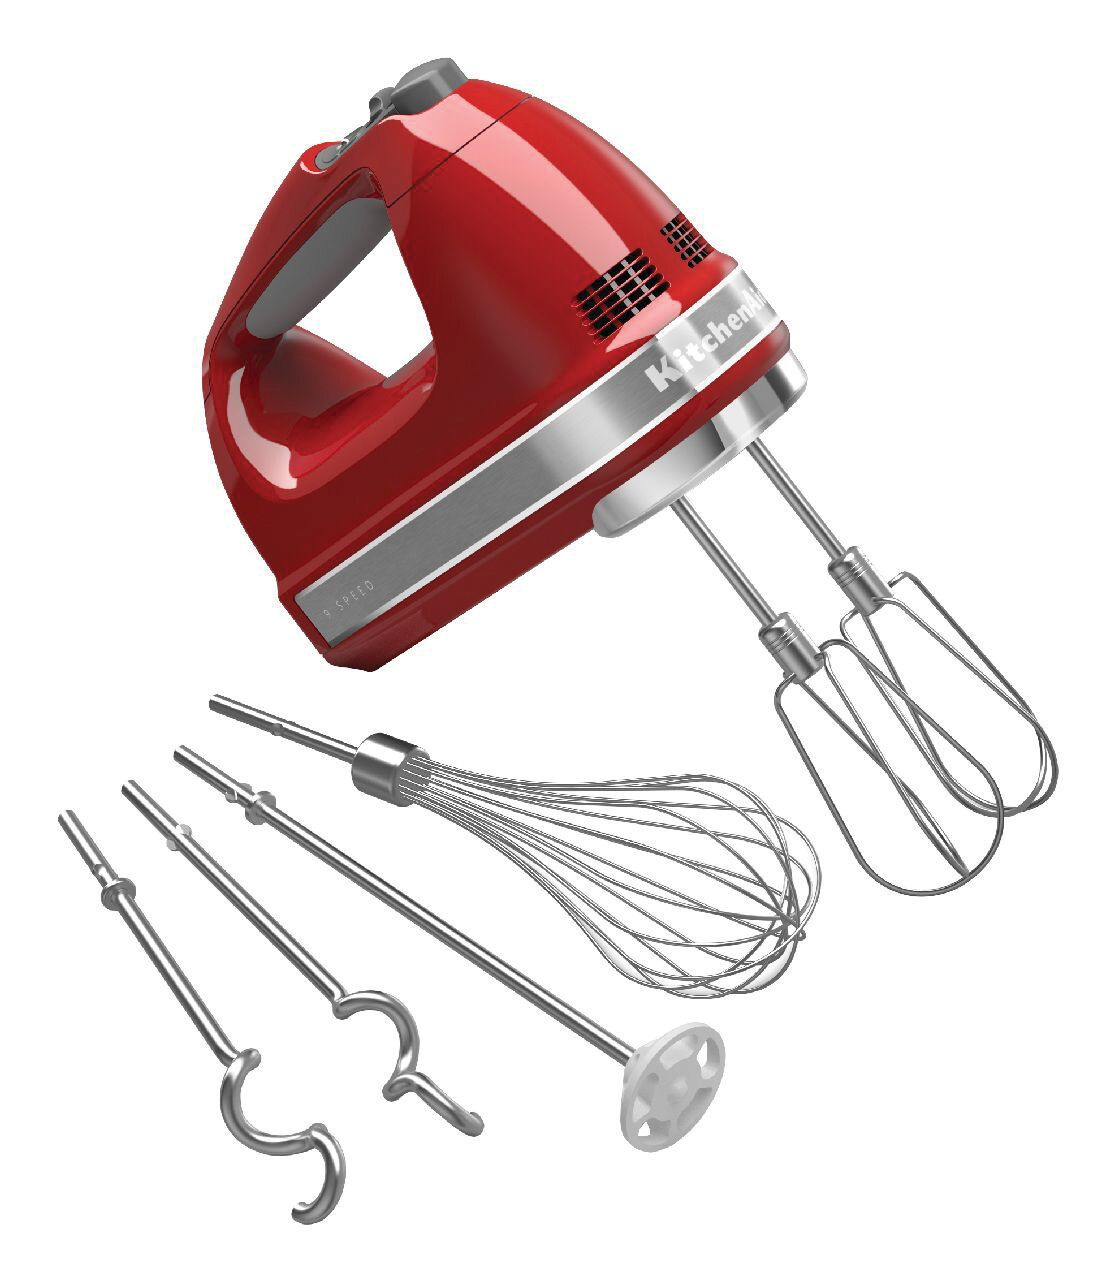 KitchenAid Artisan Hand Mixer KHM926